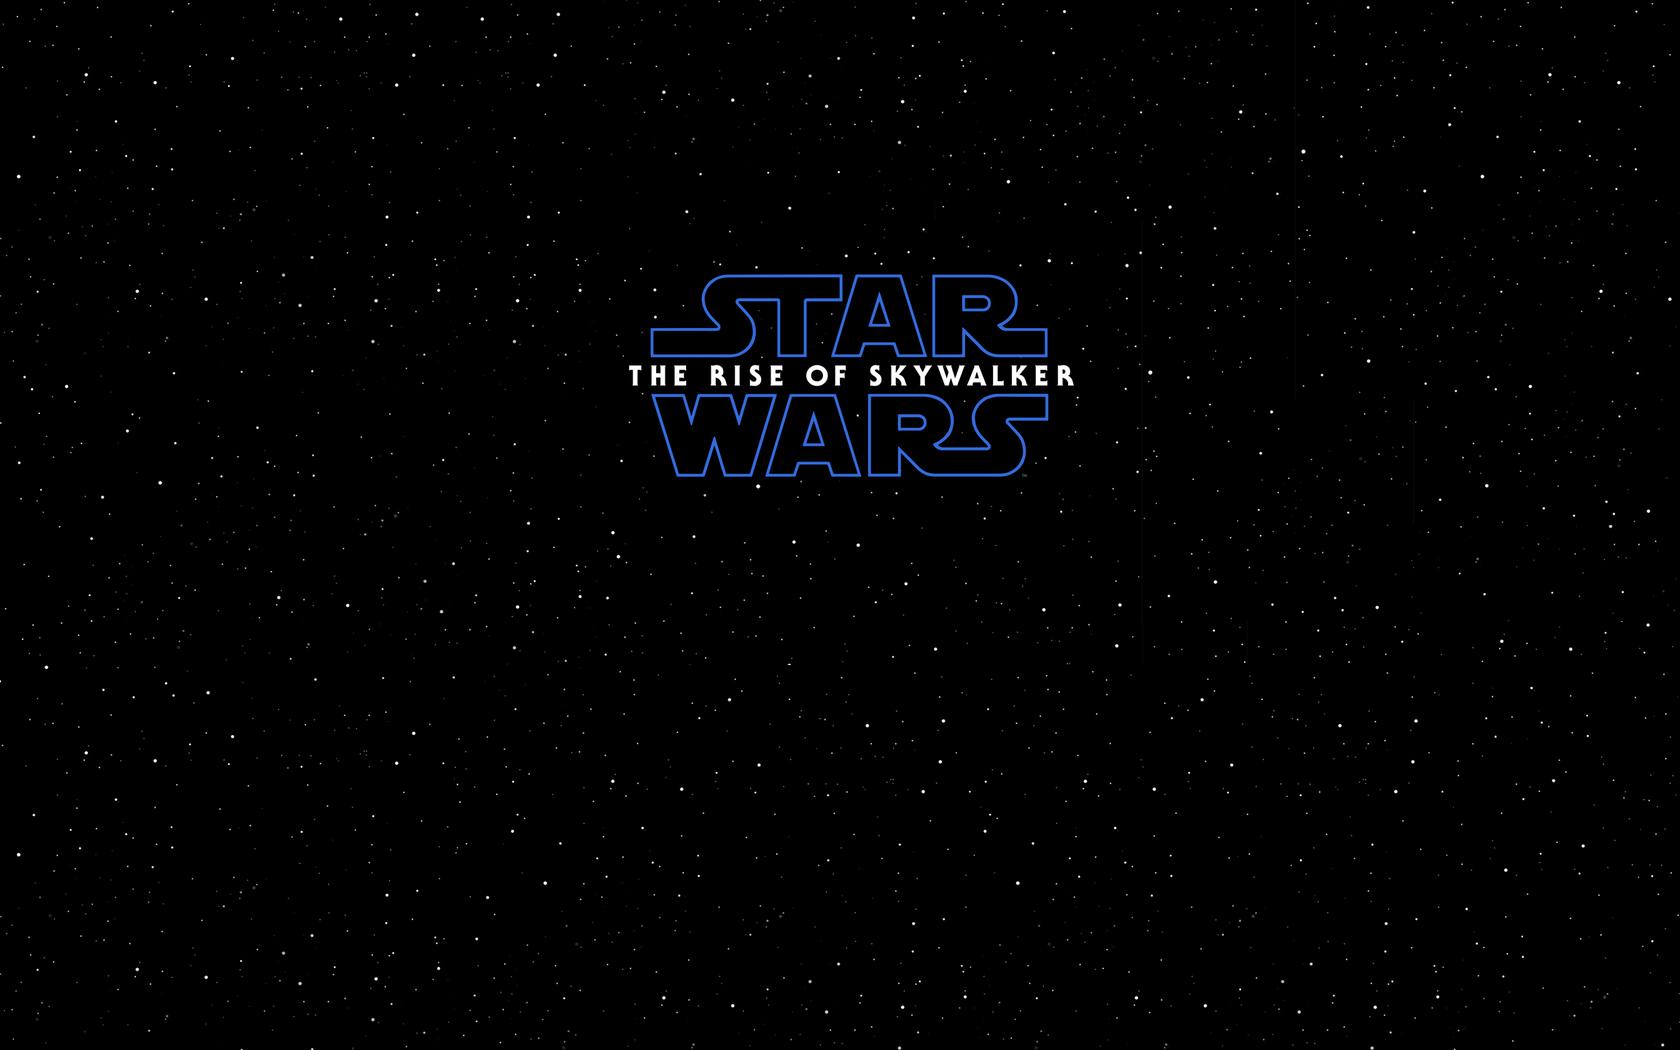 star-wars-the-rise-of-skywalker-2019-m1.jpg